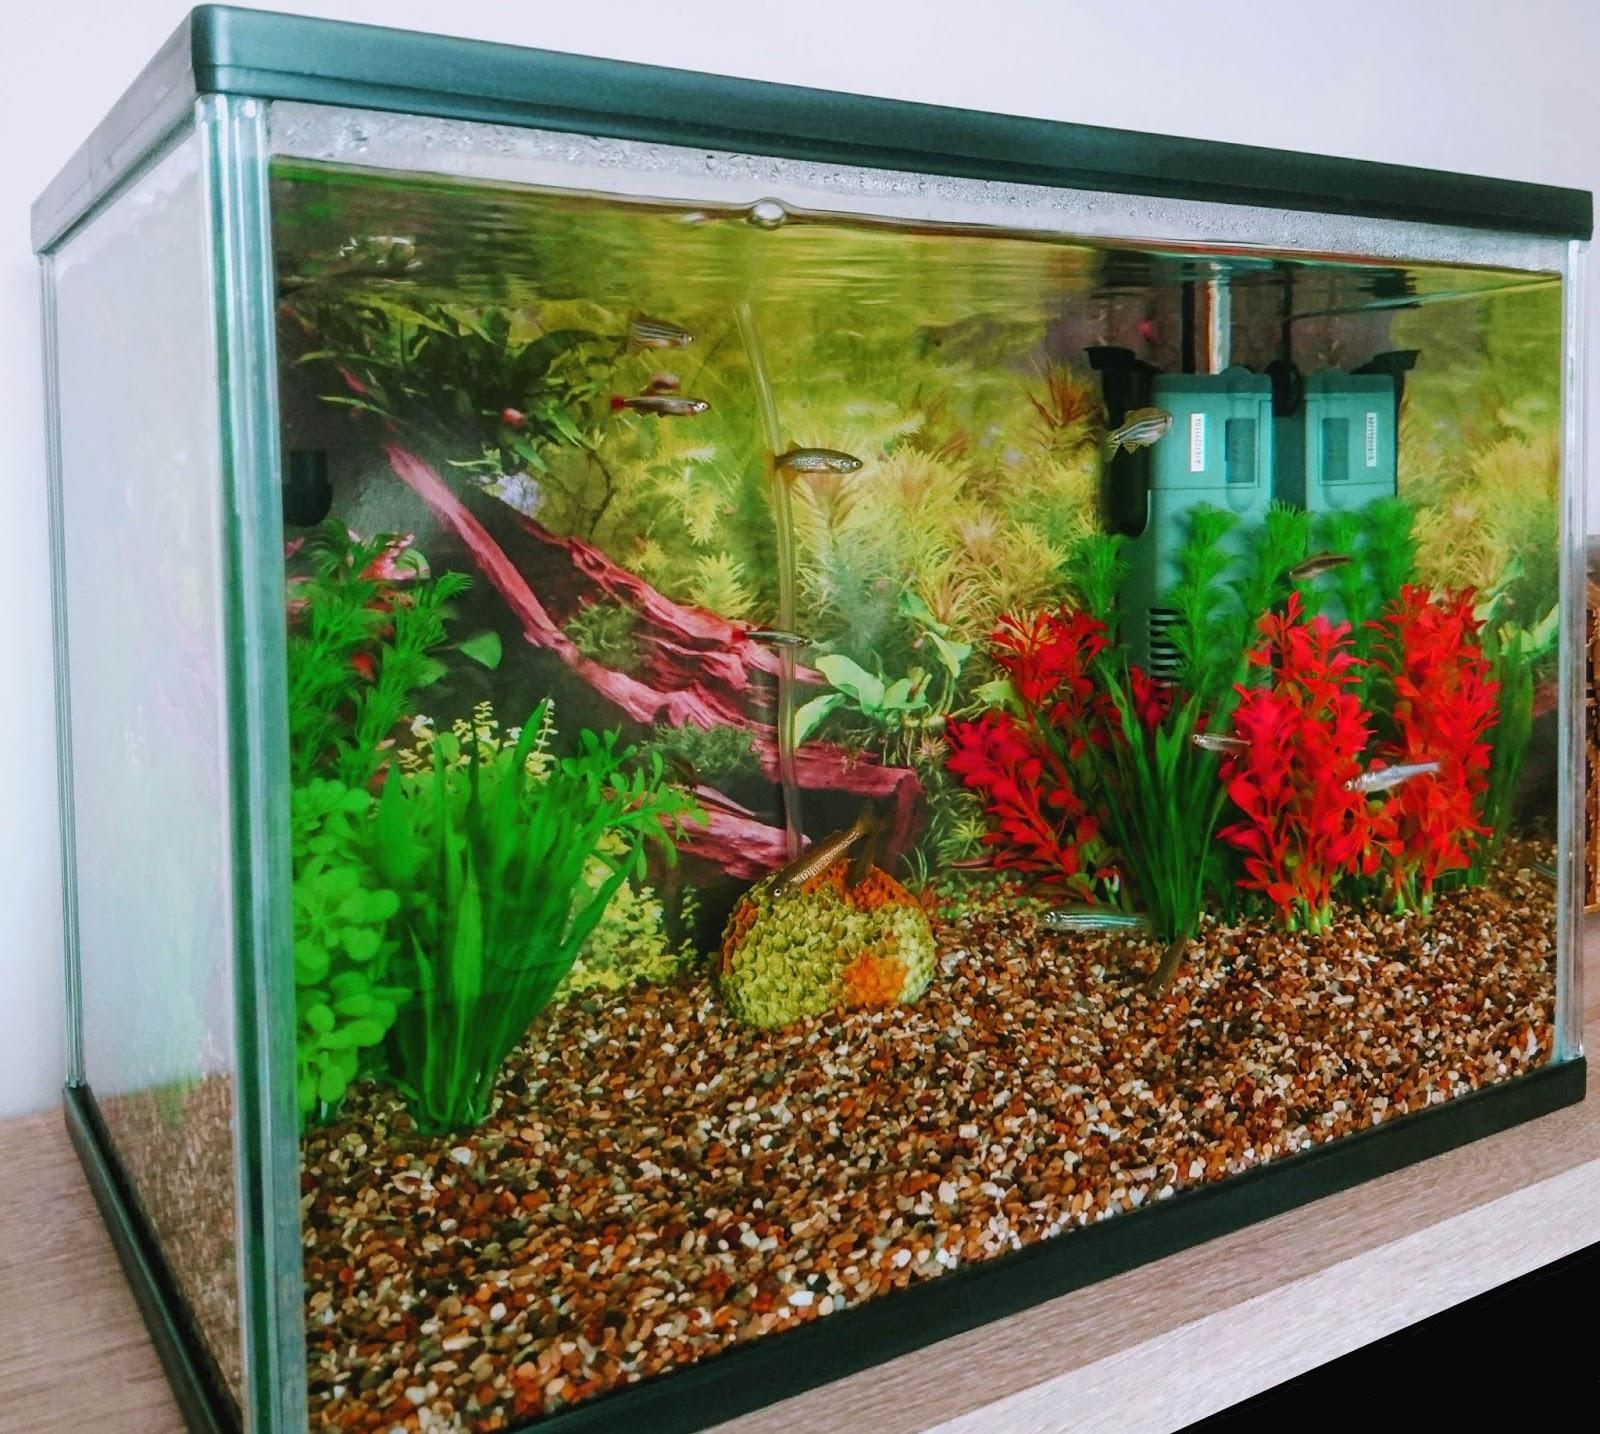 fa767b9b127 Amateur Aquatics - Keeping fish - Setting up your first fish tank - Part 1